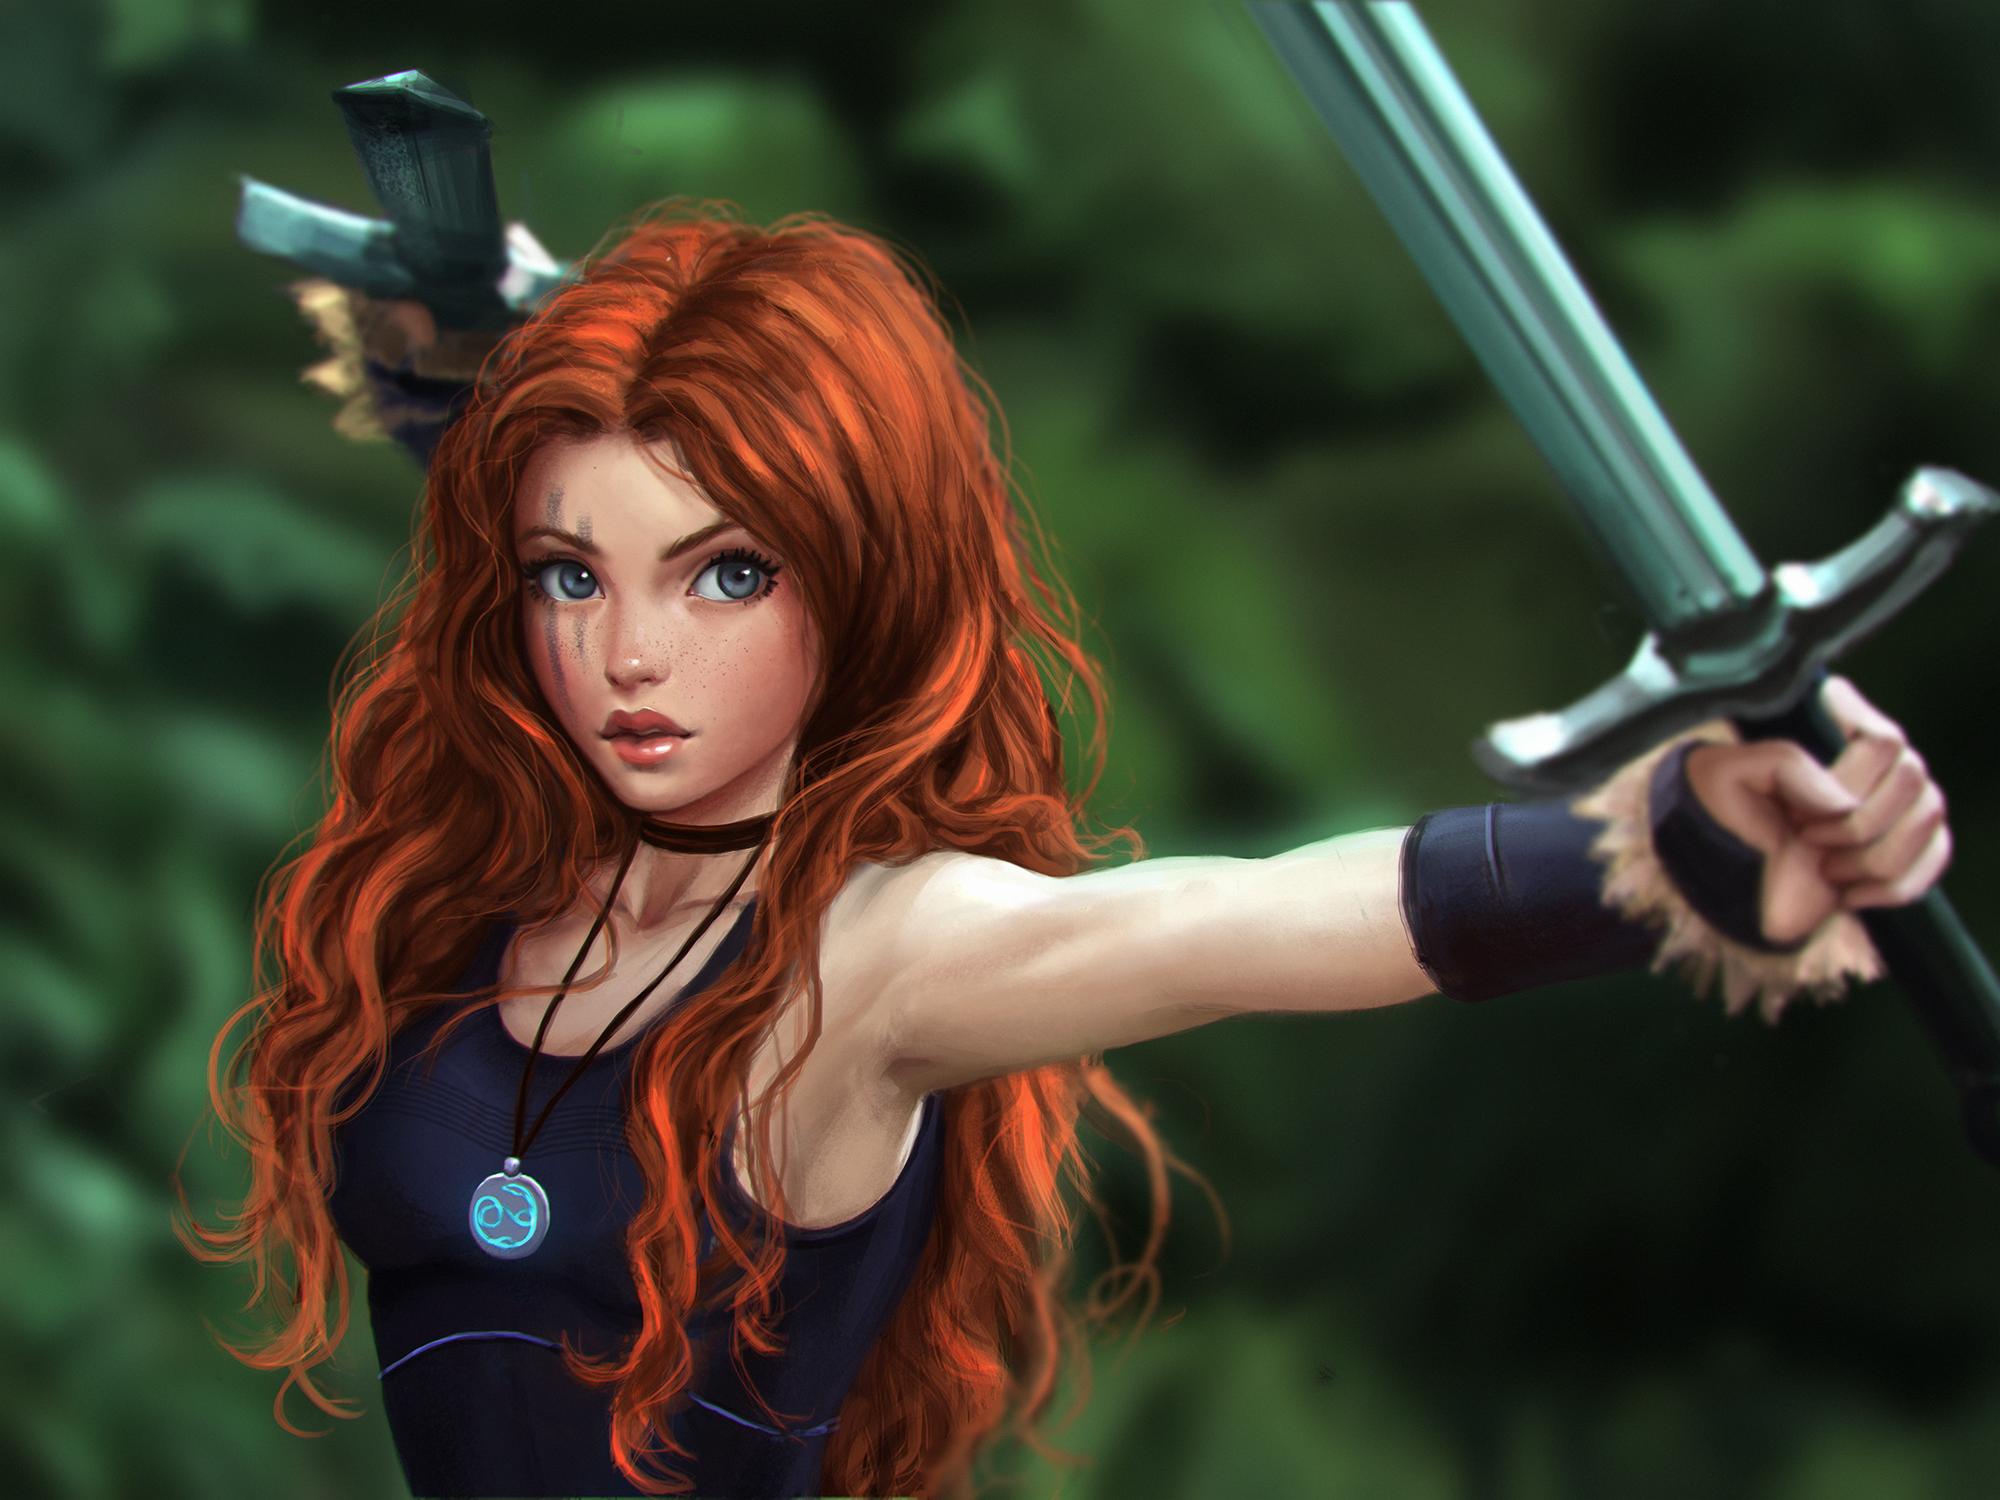 Fantasy epic women sexy image